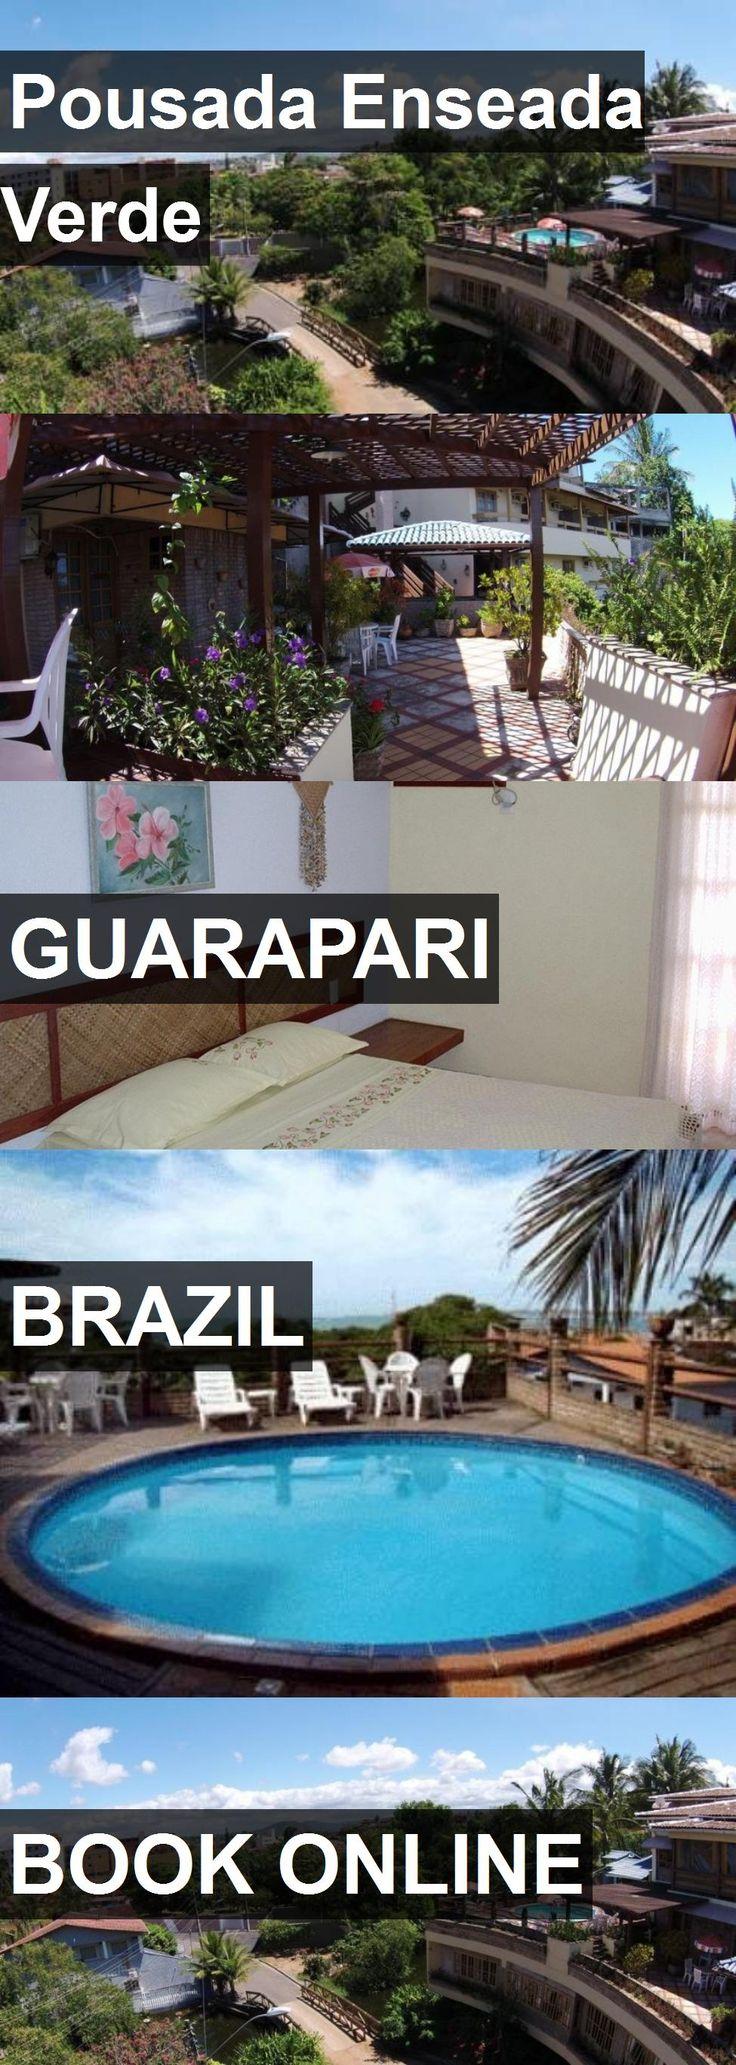 Hotel Pousada Enseada Verde in Guarapari, Brazil. For more information, photos, reviews and best prices please follow the link. #Brazil #Guarapari #PousadaEnseadaVerde #hotel #travel #vacation